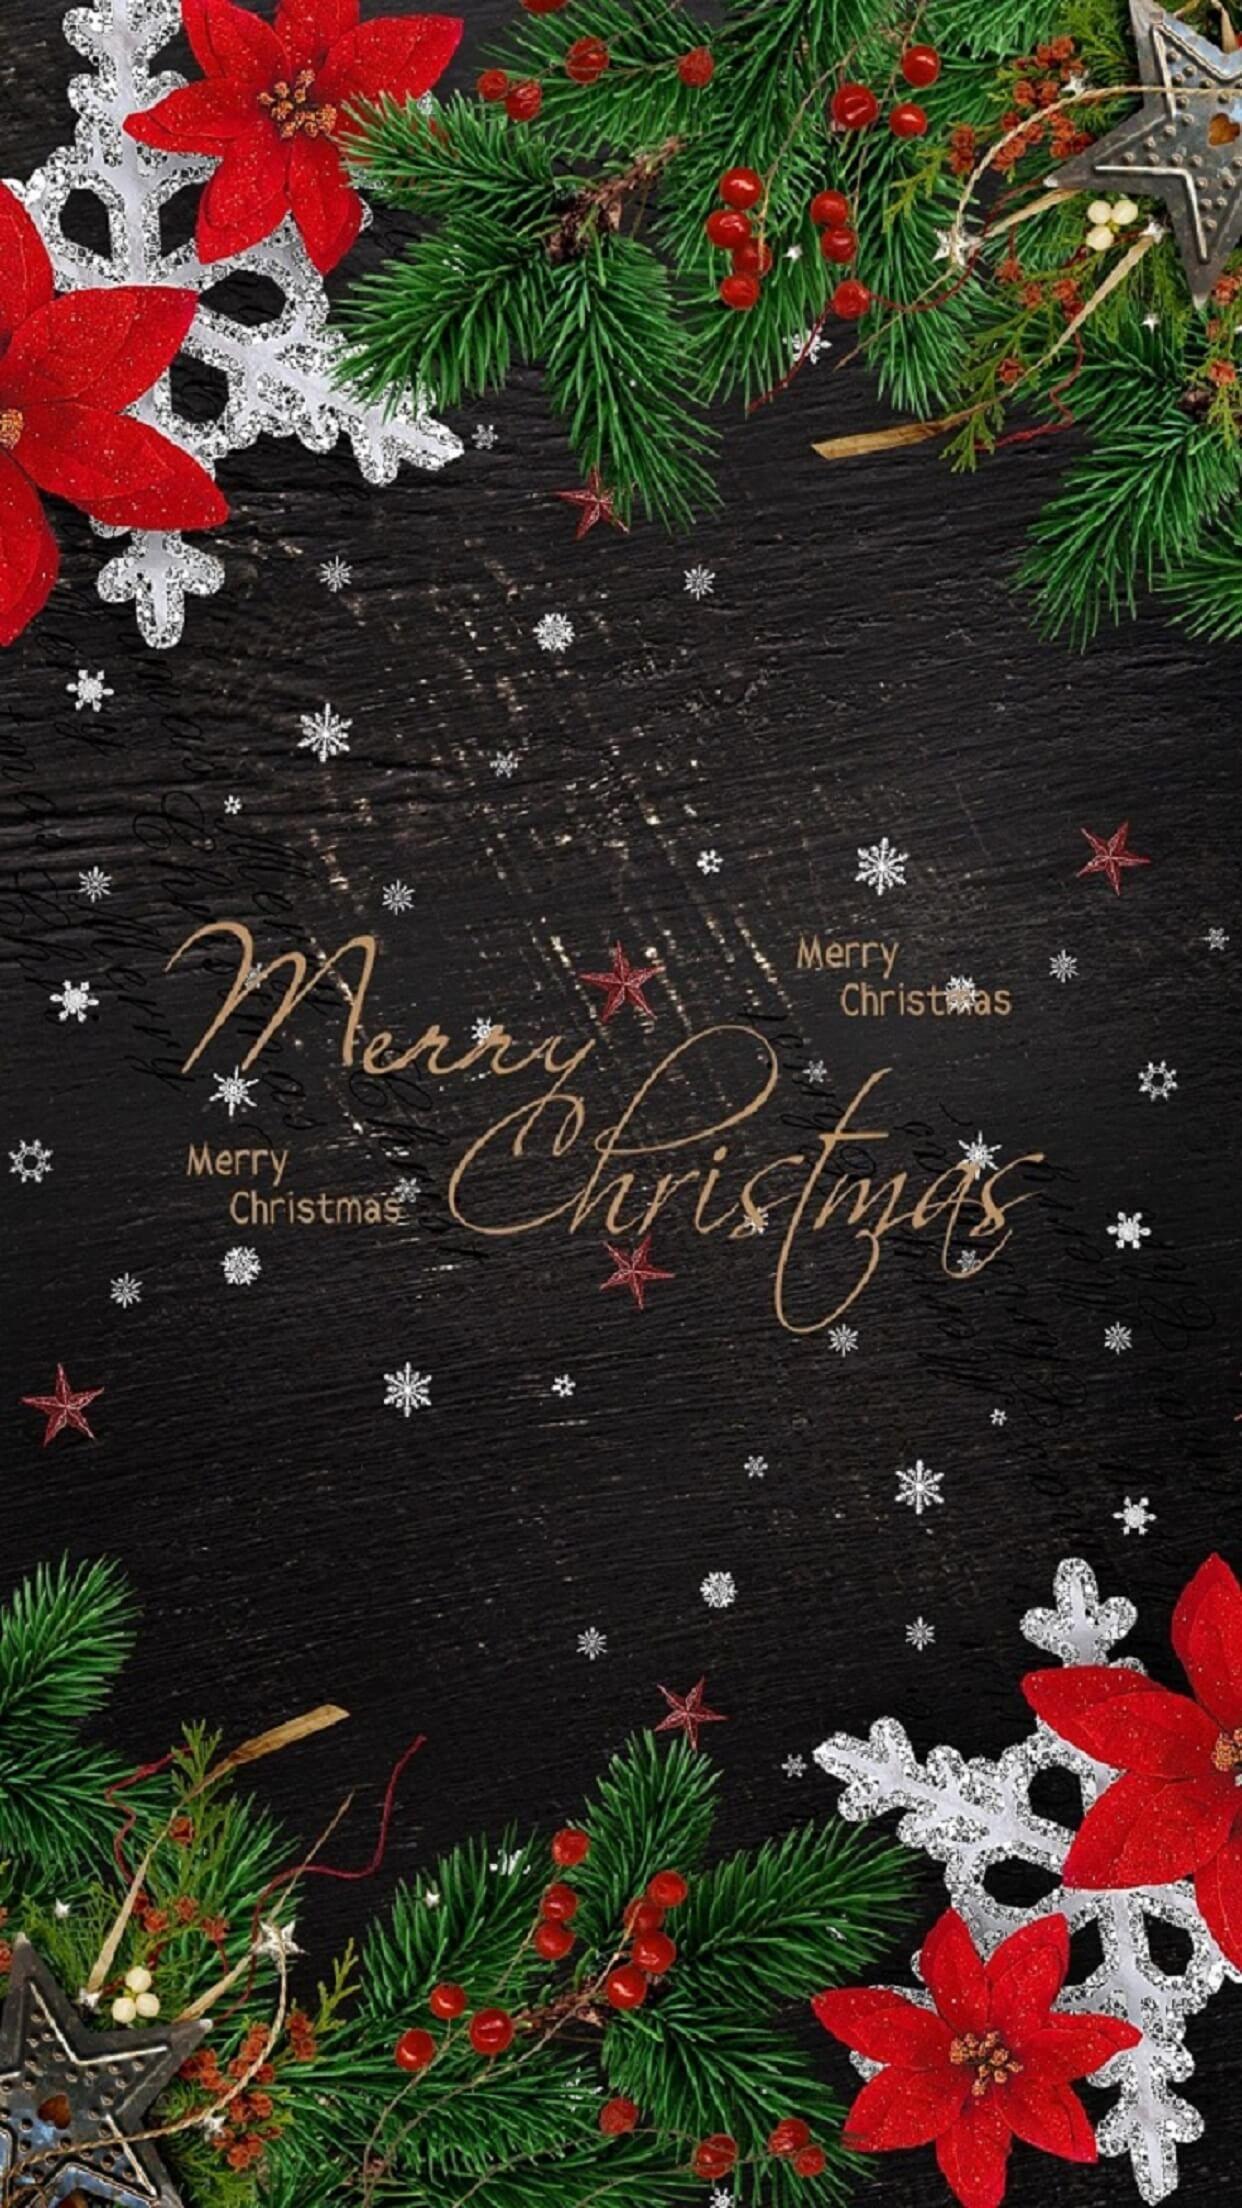 iPhone wallpaper 27 Christmas wallpaper hd, Merry